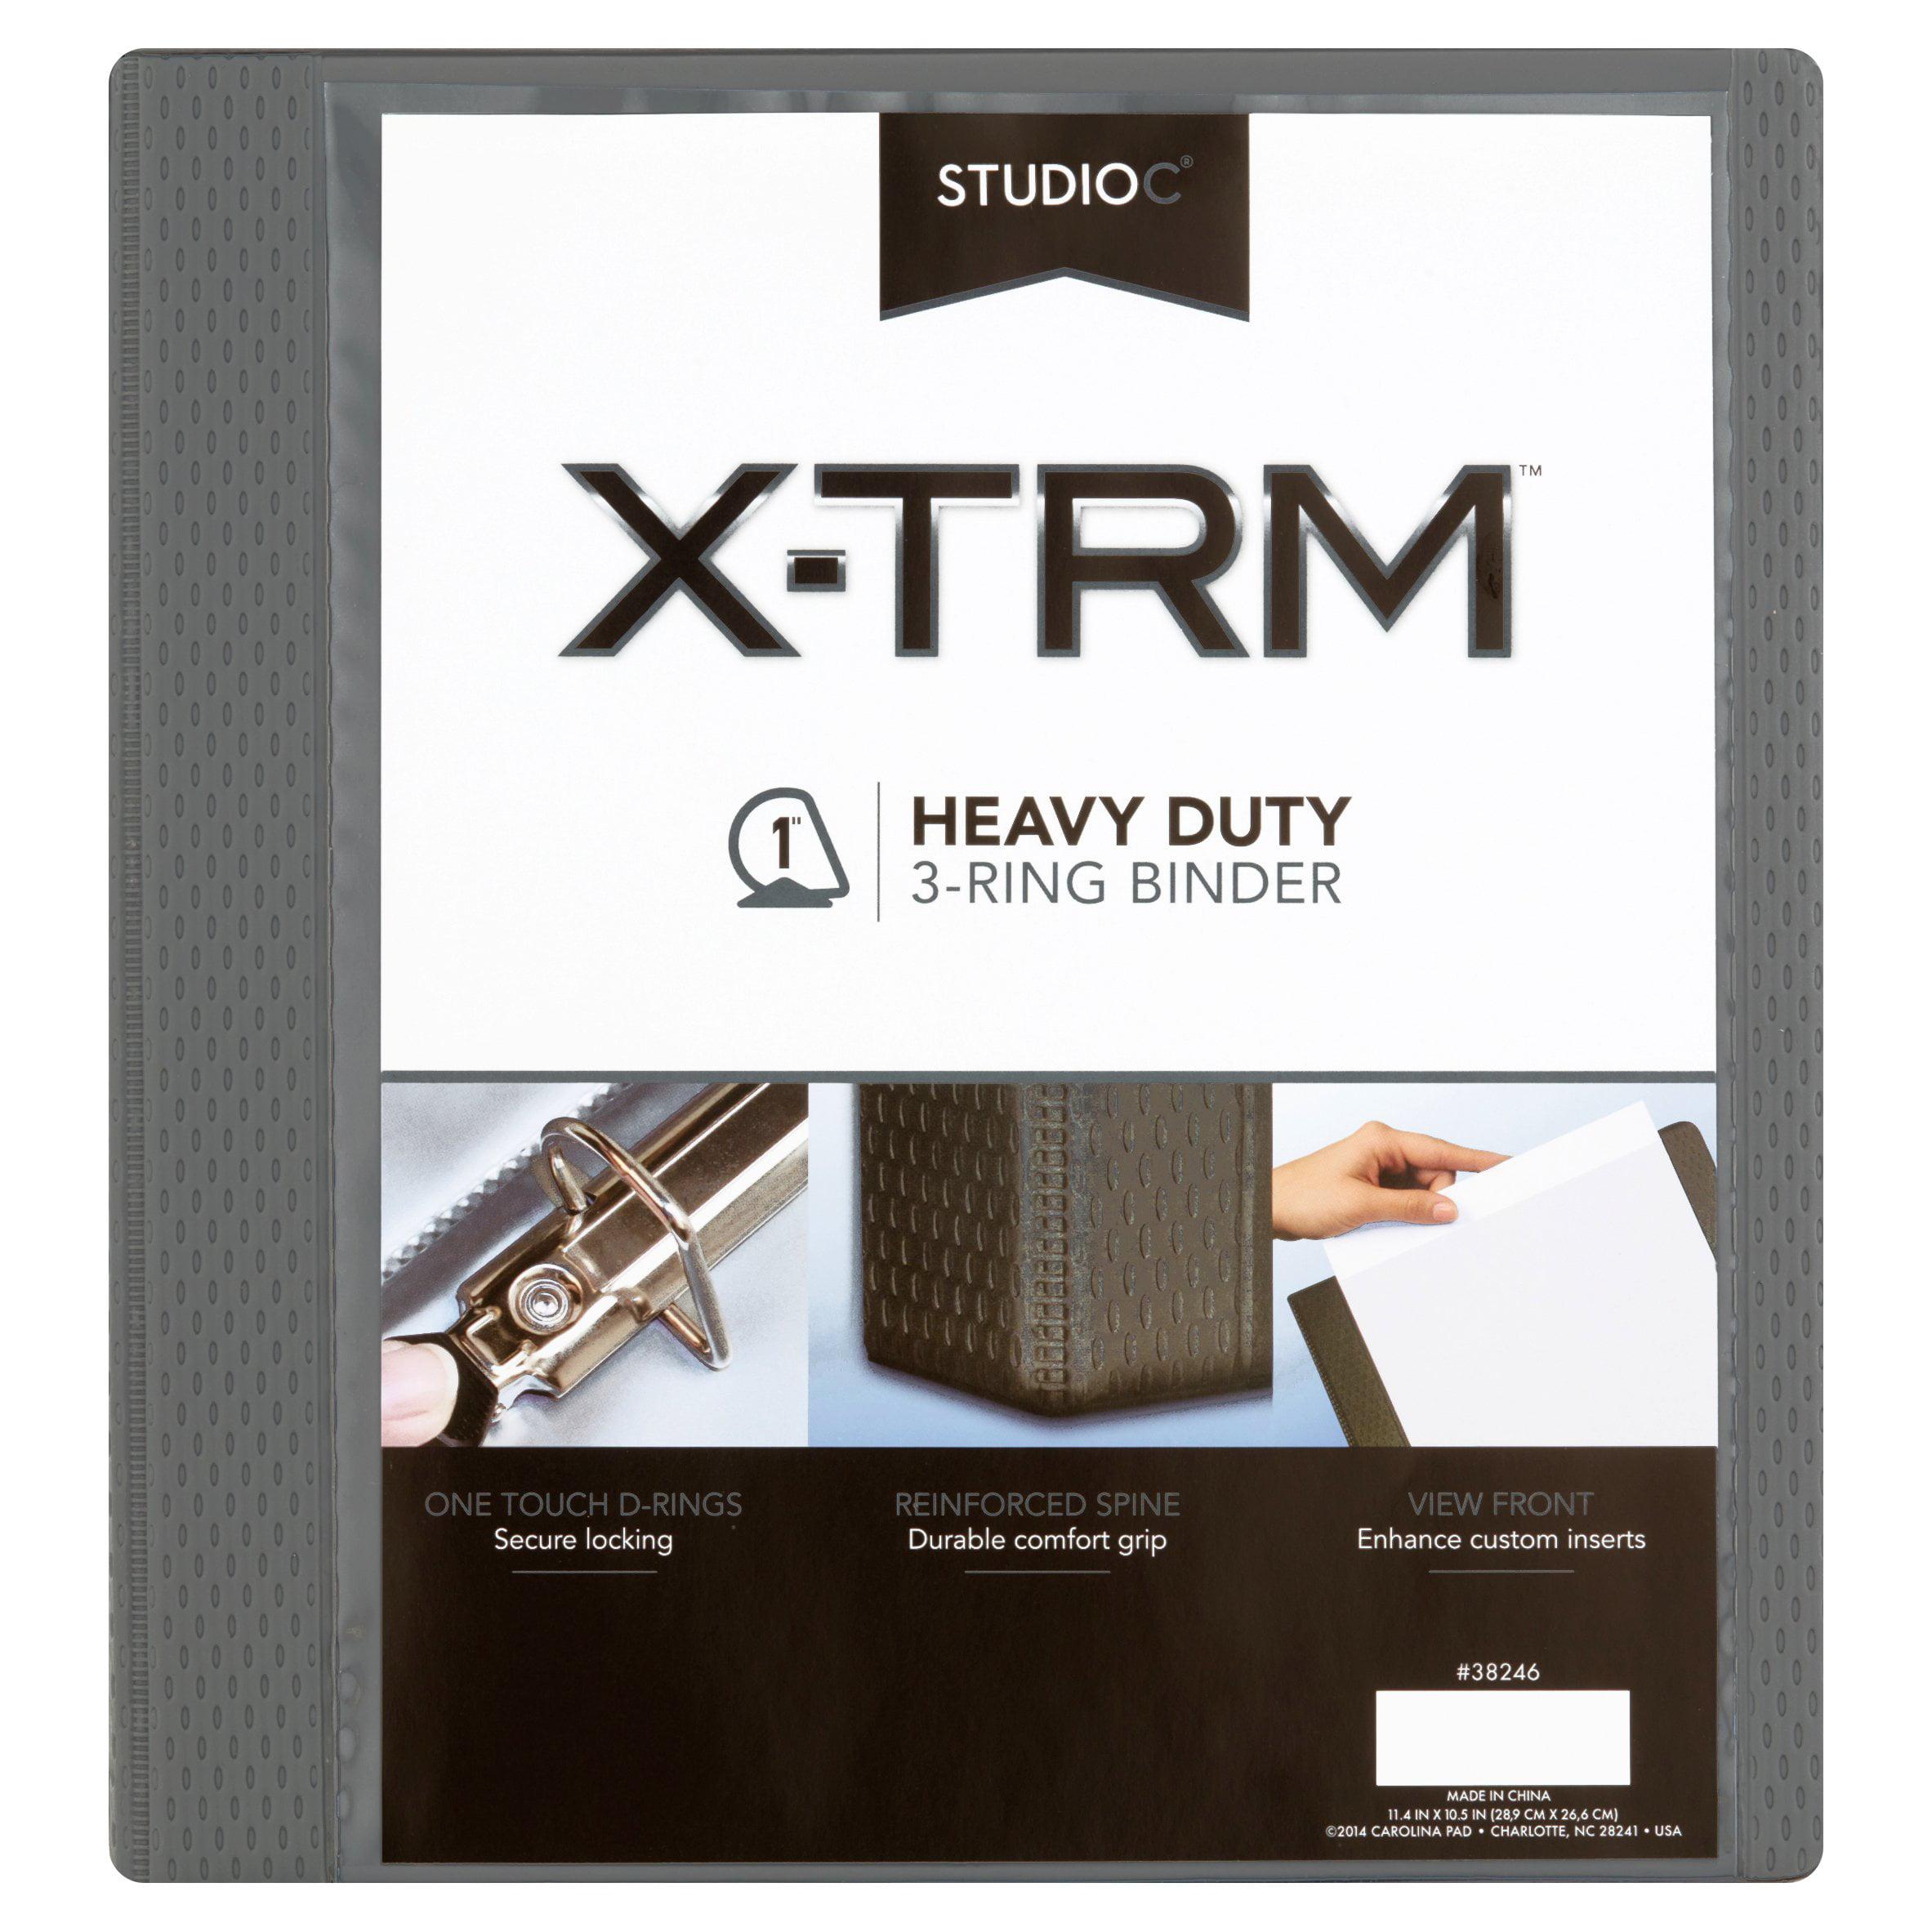 "Studio C X-TRM 1"" Heavy Duty 3-Ring Binder"